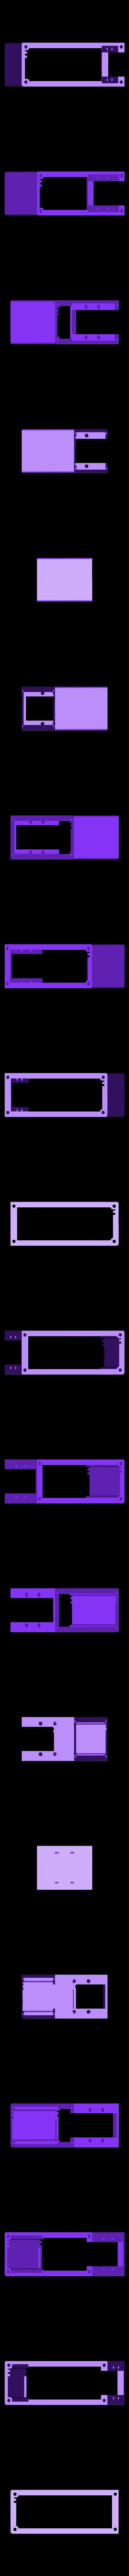 lcd1920x1200base_half-2.STL Download free STL file LCD controller case V29, V59 • 3D printer object, victor999